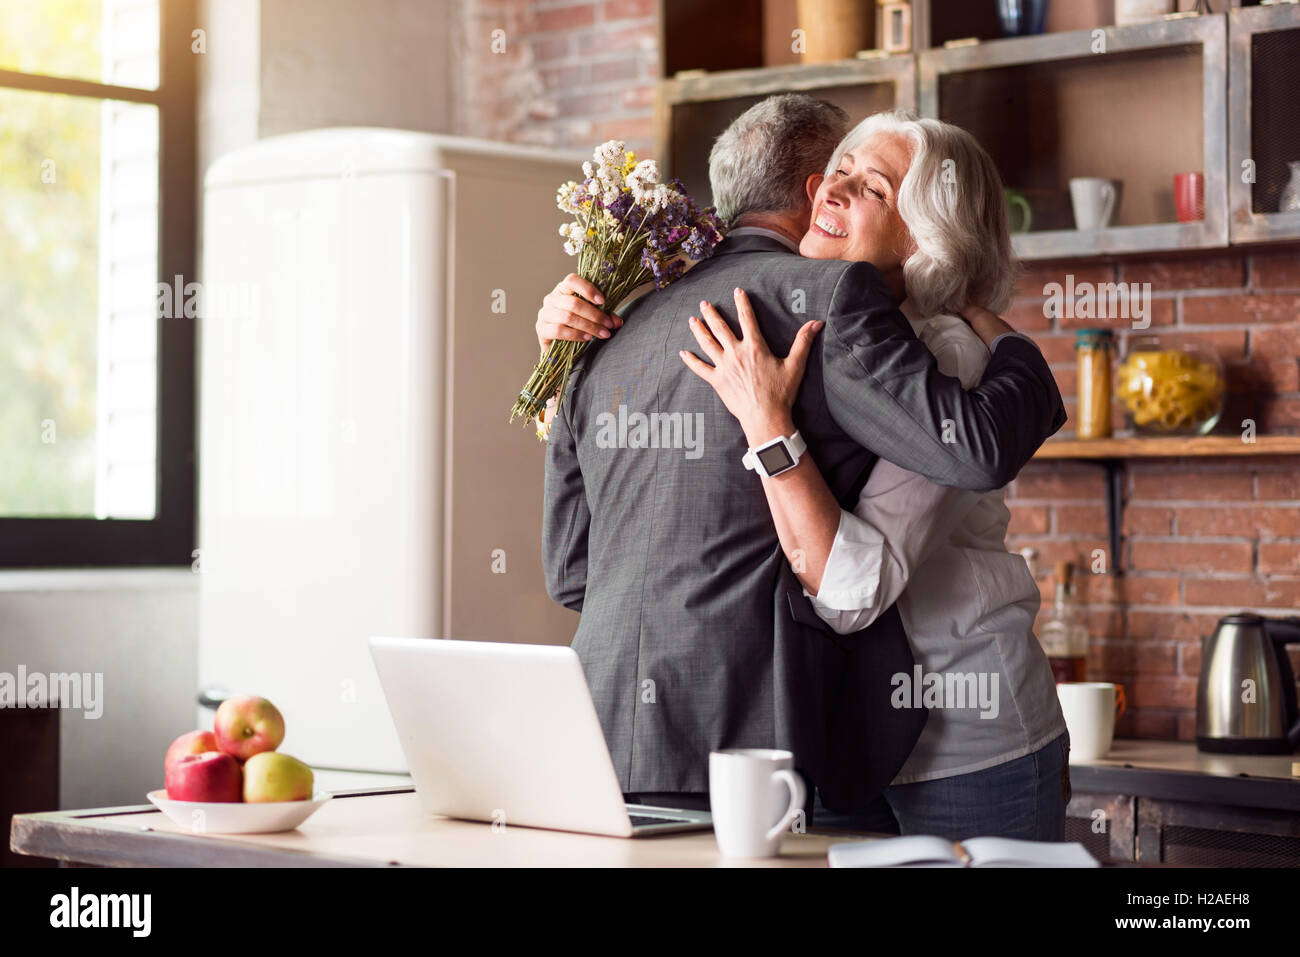 Happy wedding anniversary of elderly people - Stock Image